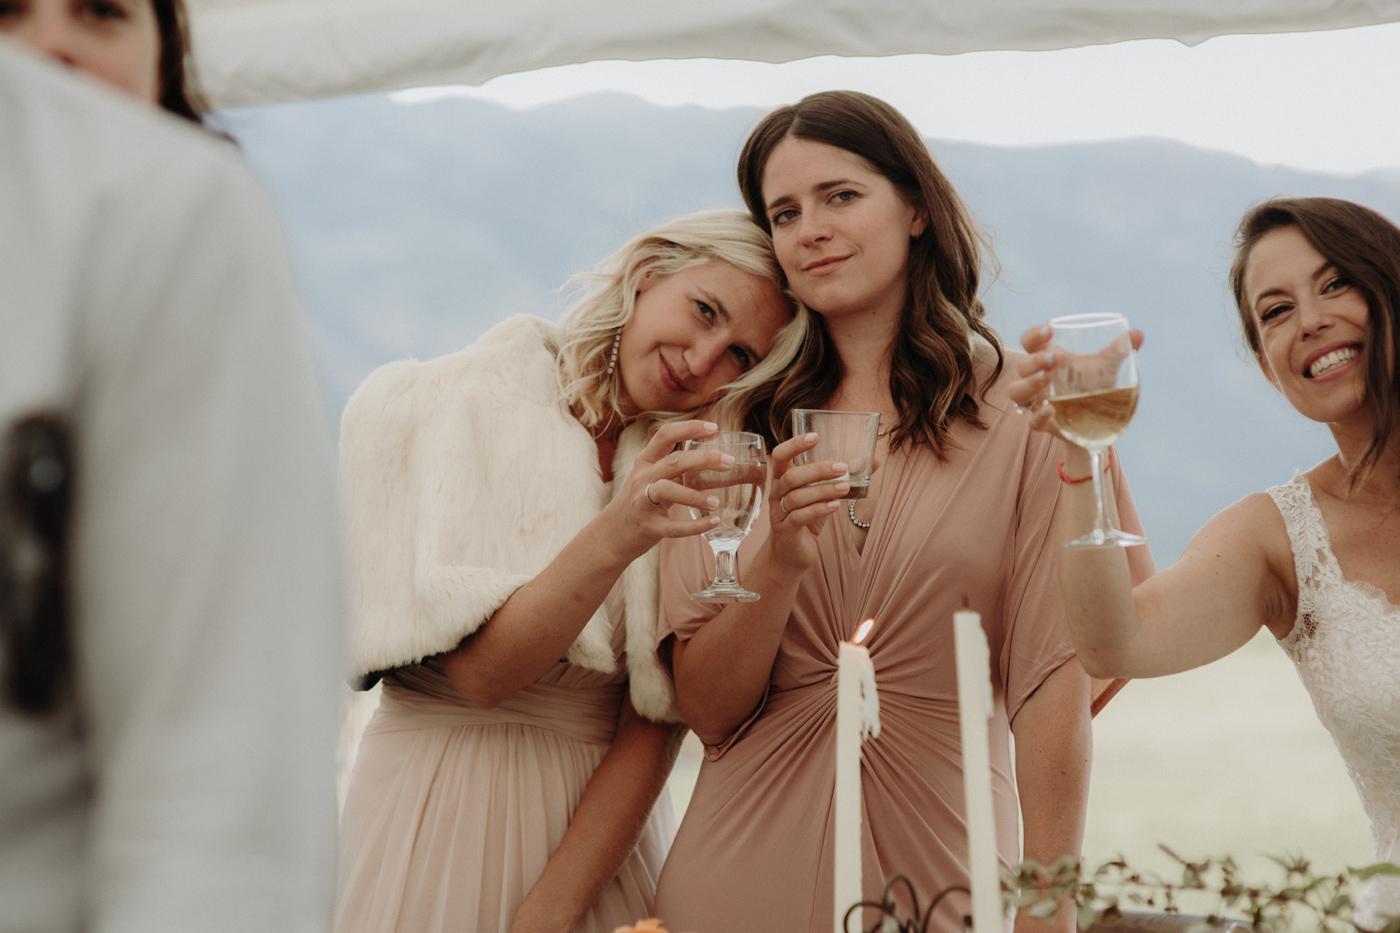 089-grand-teton-jackson-hole-wyoming-wedding.jpg